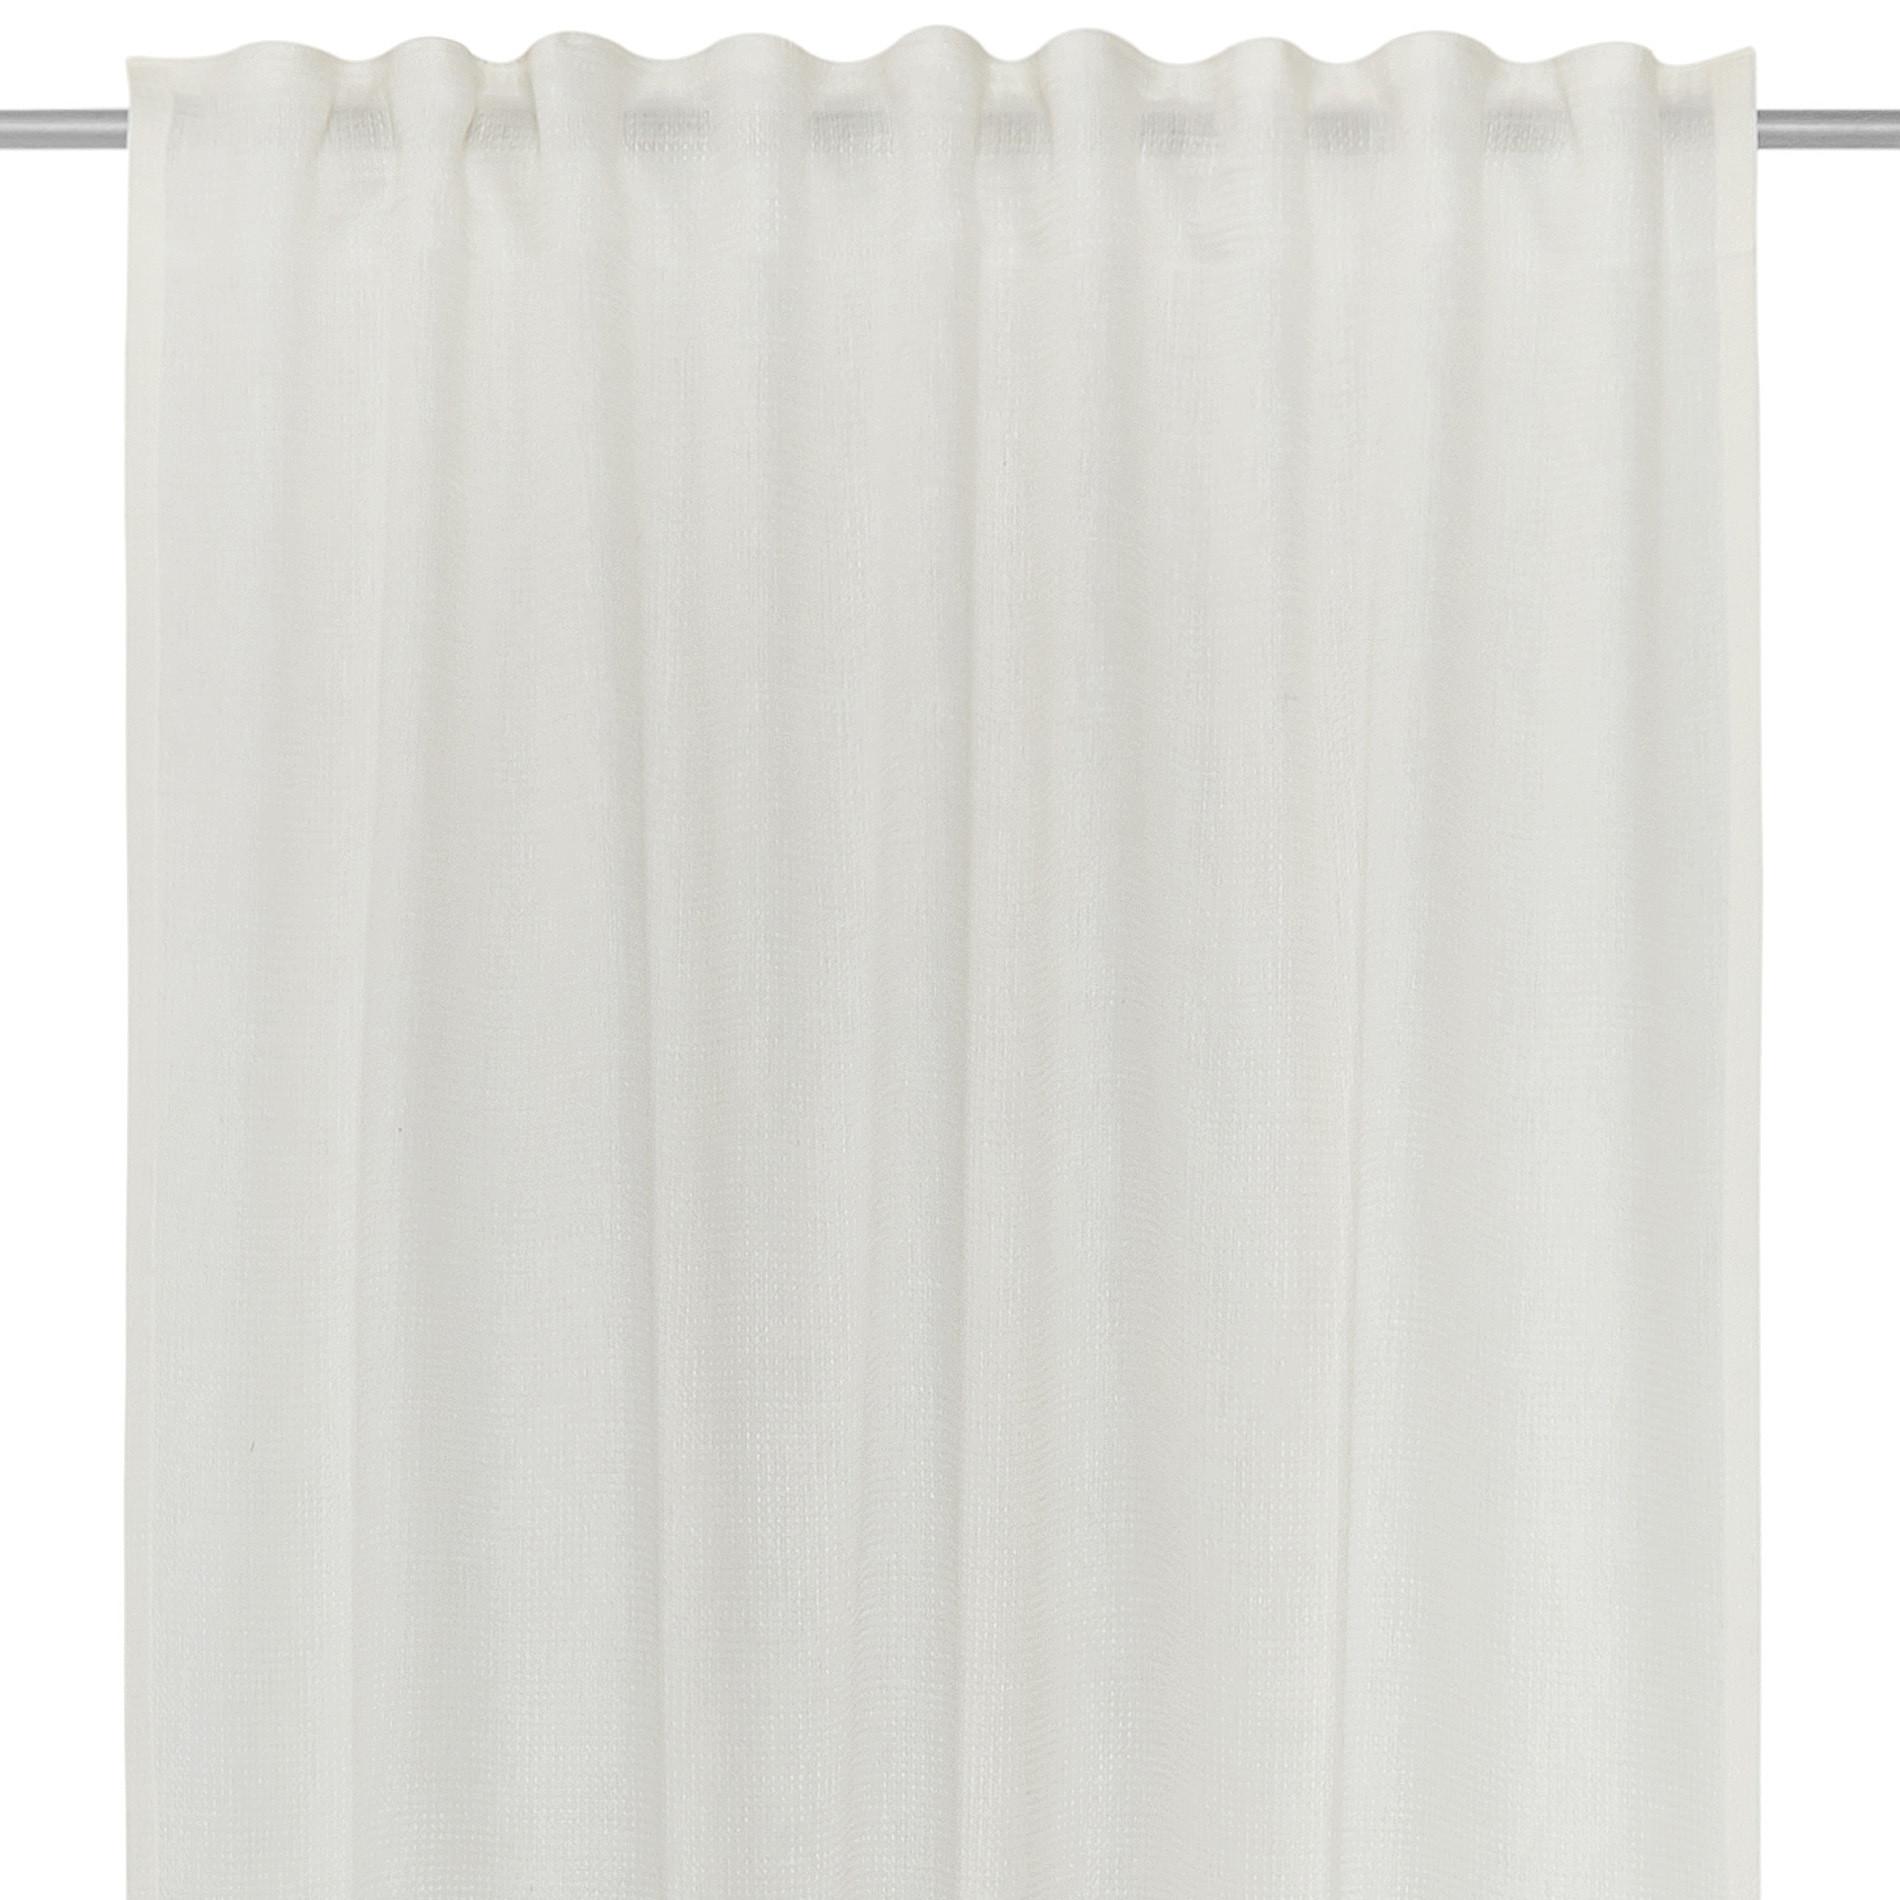 Tenda misto lino passanti nascosti, Bianco, large image number 3